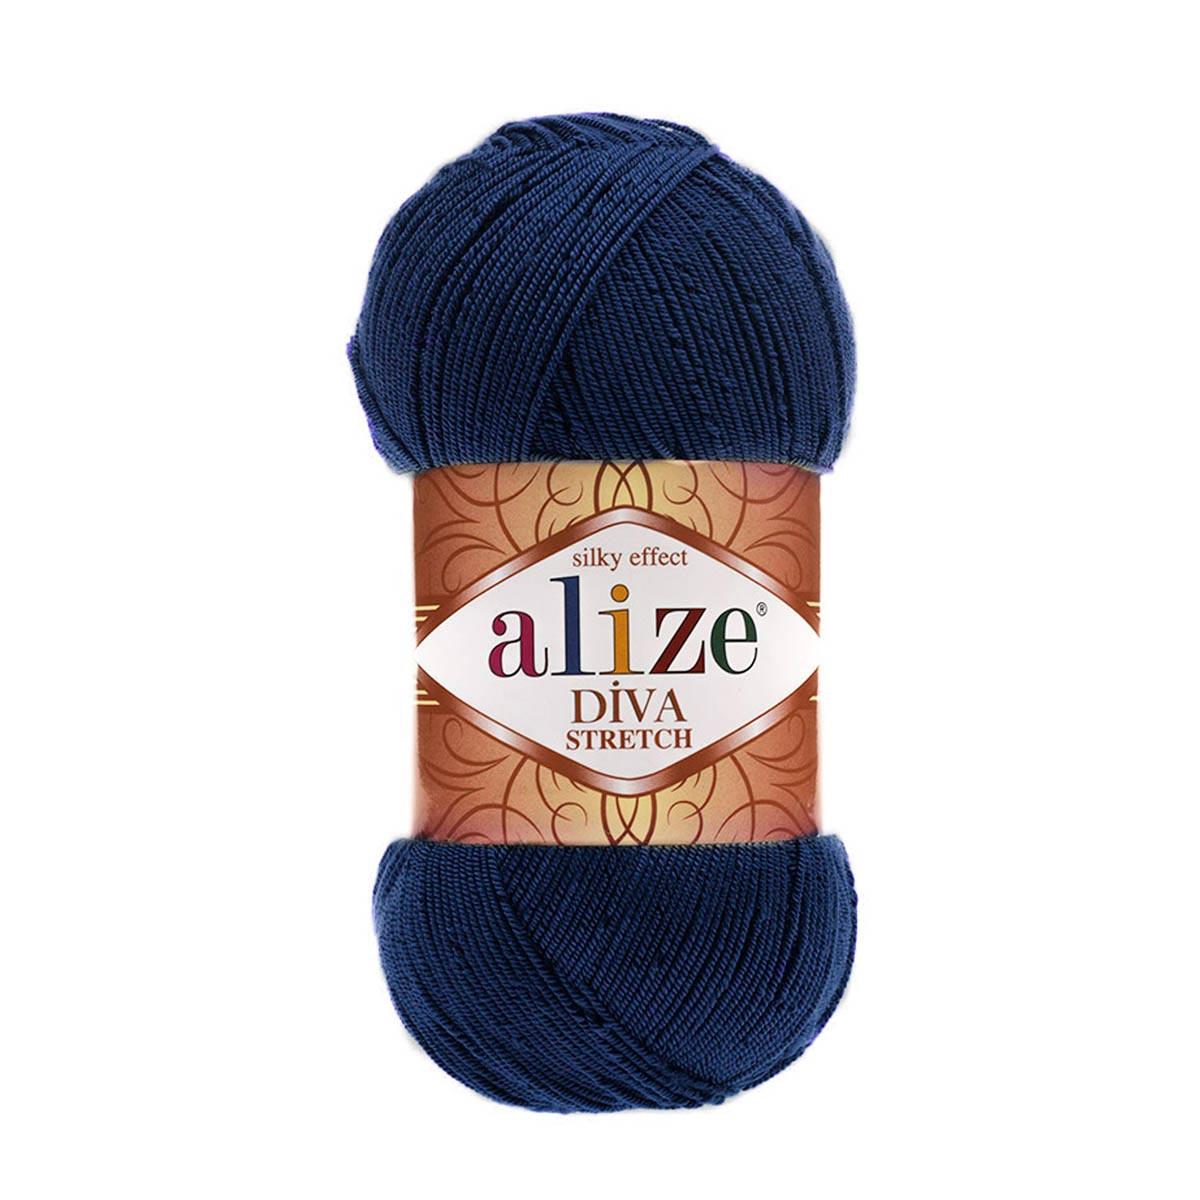 Пряжа ALIZE 'Diva stretch' 100гр. 400м. (92% микроакрил, 8%эластик)